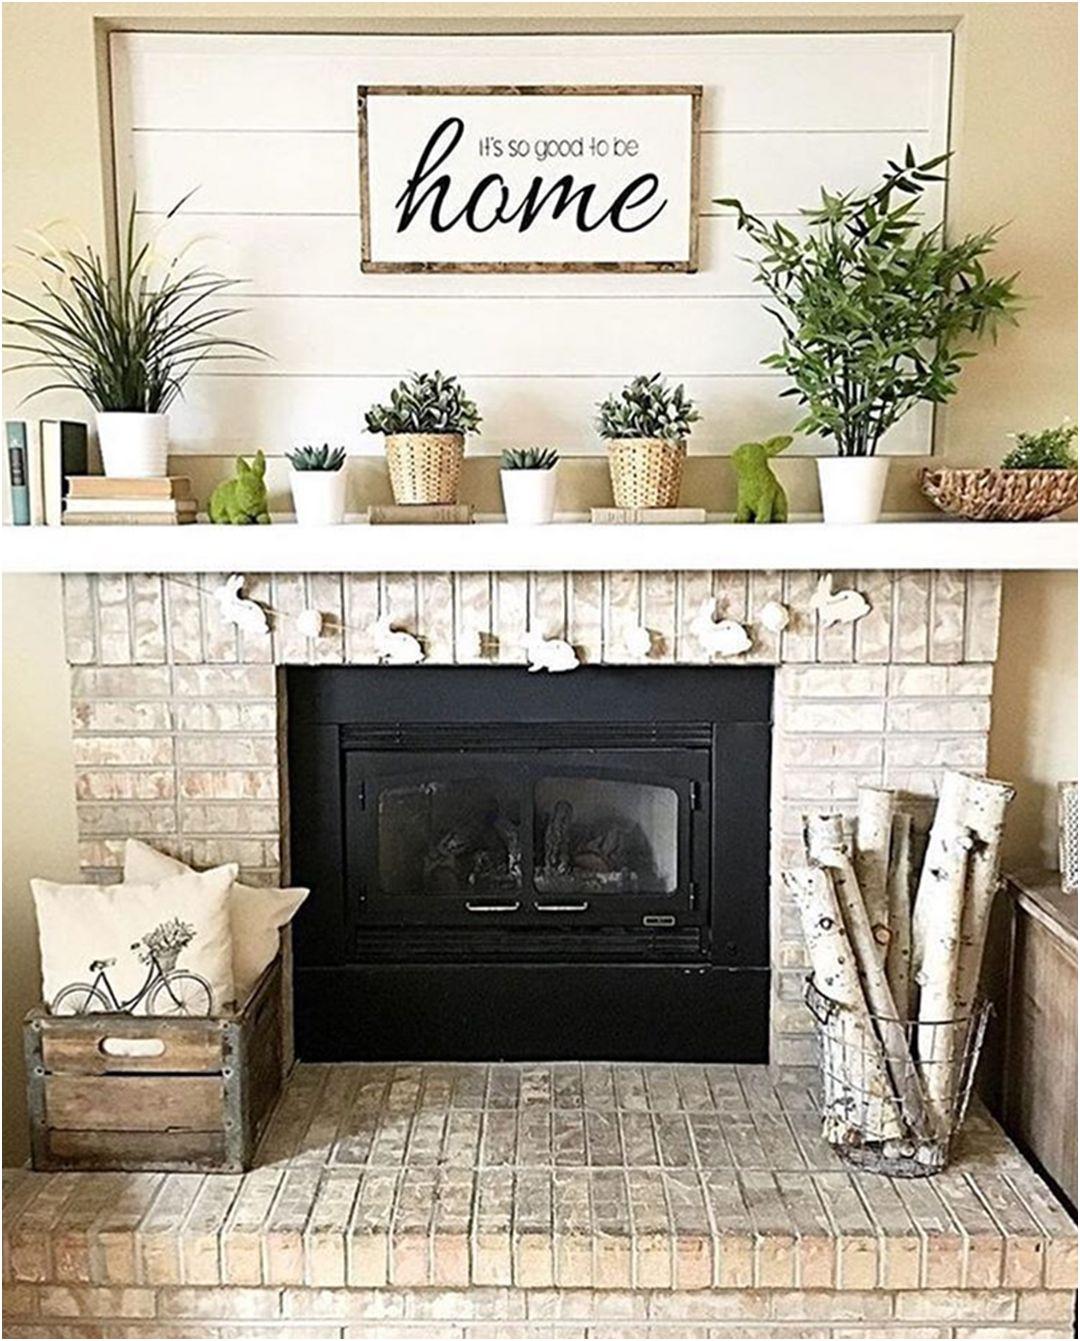 Ideas to Decorate Fireplace Mantel Unique Farmhouse Fireplace Mantel Decor Decor It S